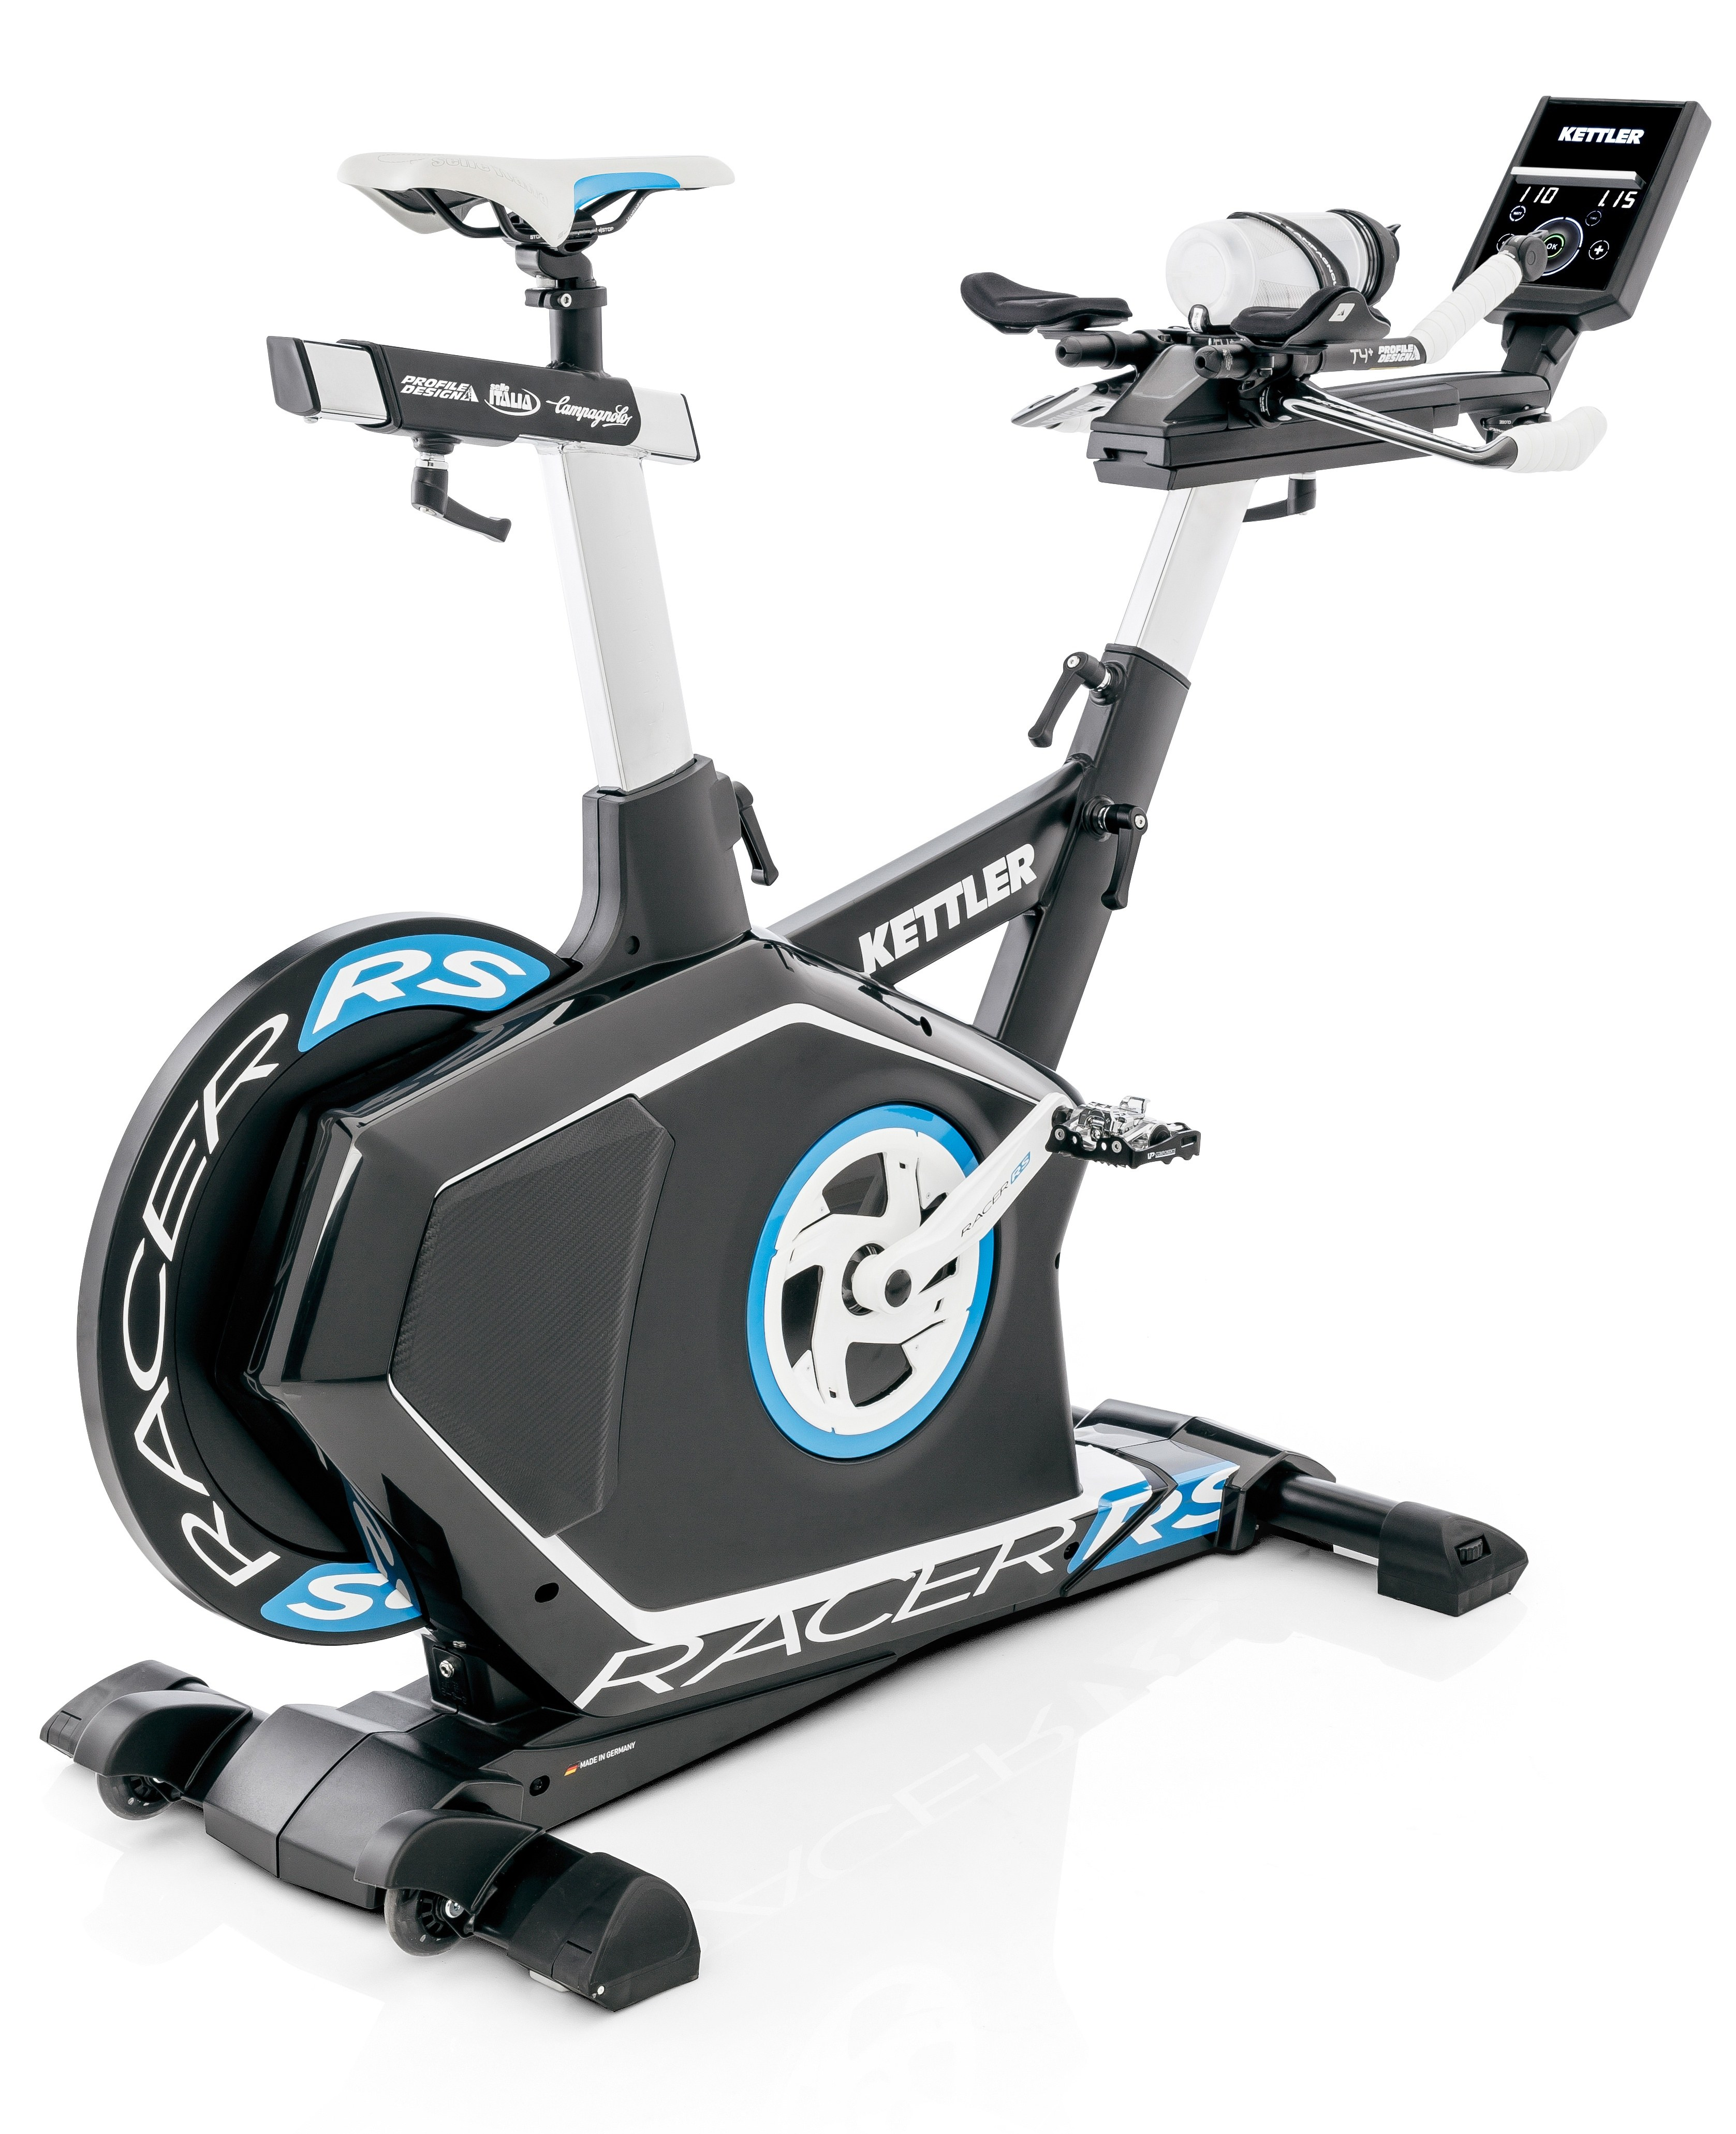 Kettler Racer Rs Indoor Cycling Magazin